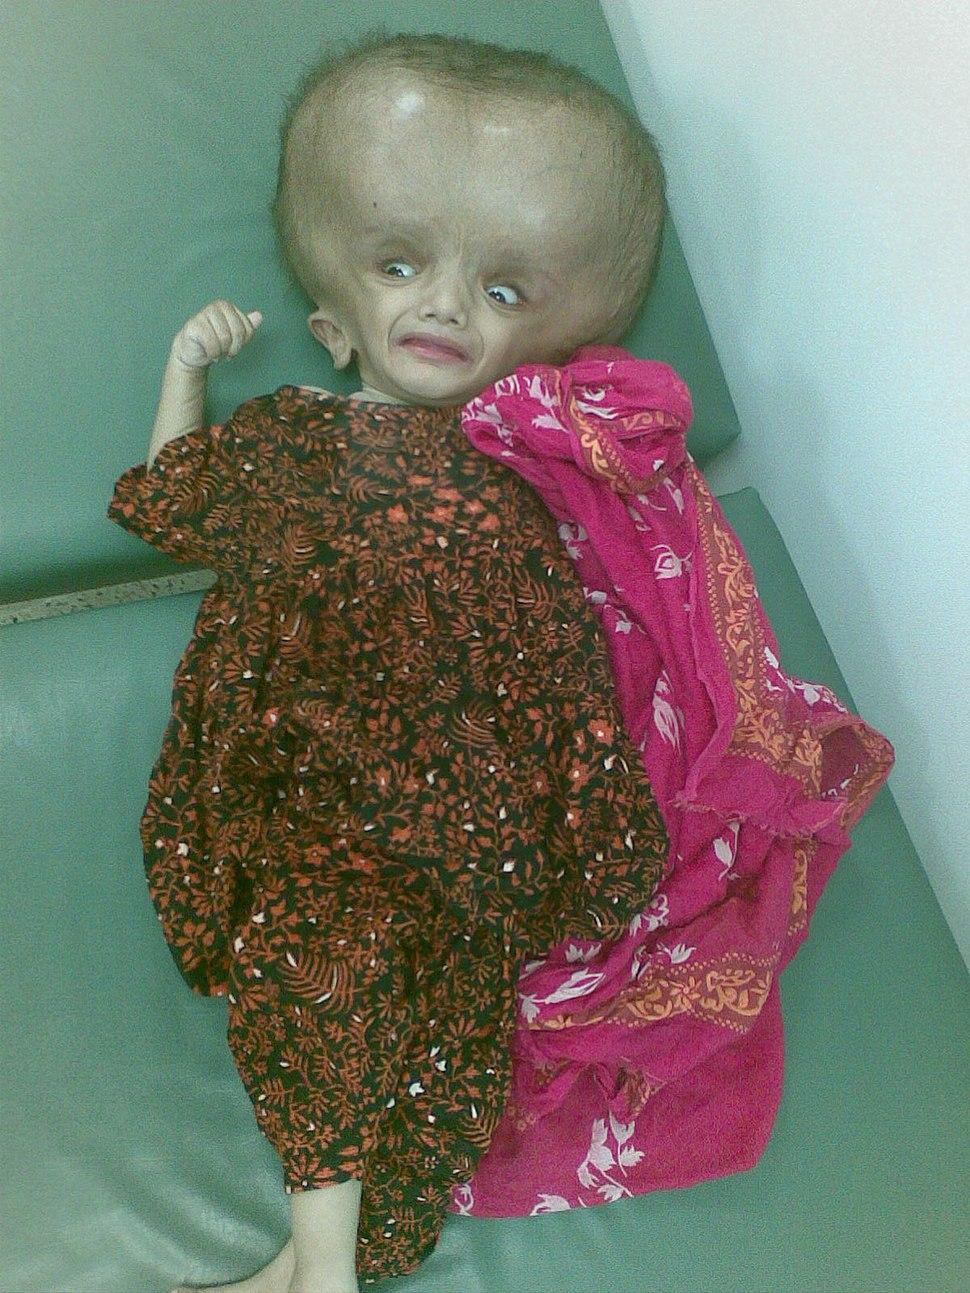 5fa3e3ada تضخم حجم الرأس بشدة بسبب استسقاء الدماغ في طفلة عمرها 11 شهر